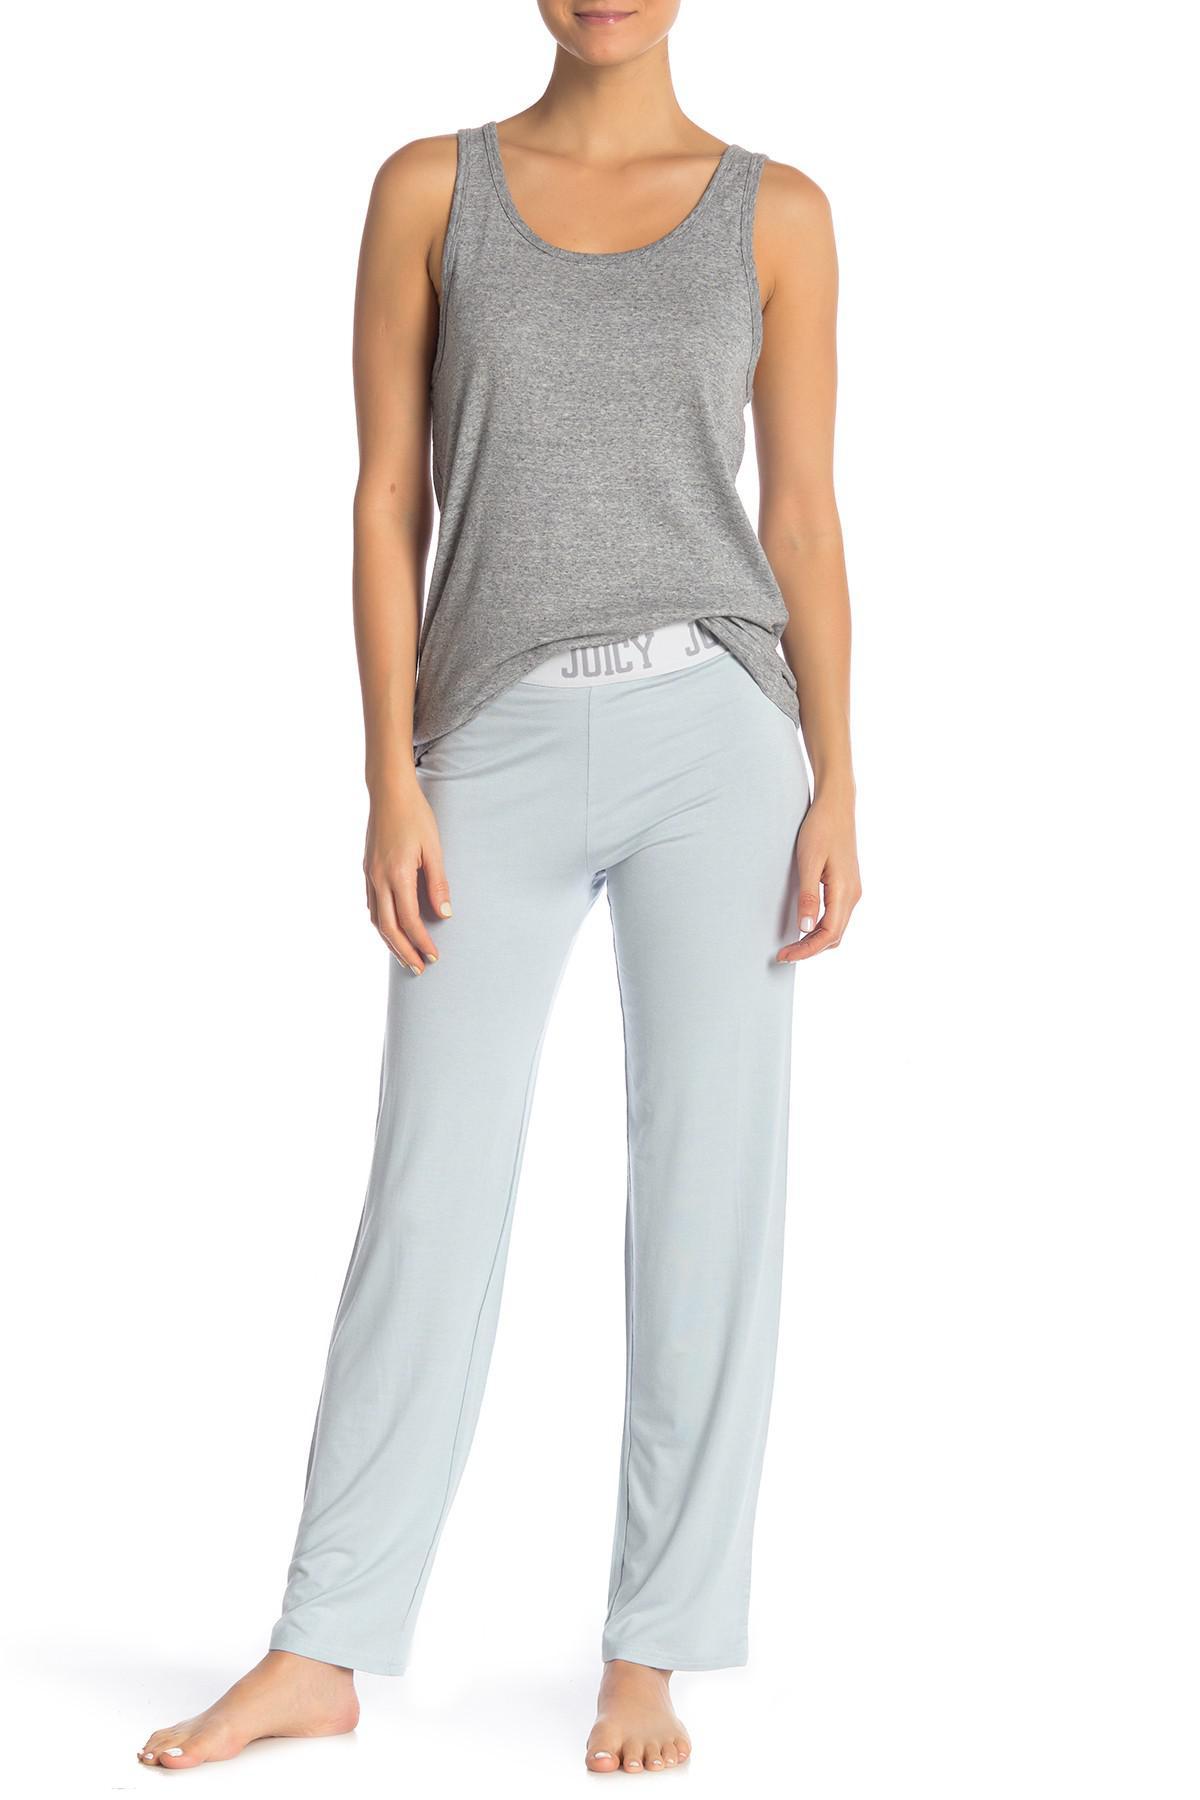 a7c1d15bdd Lyst - Juicy Couture Juicy Logo Pajama Pants in Blue